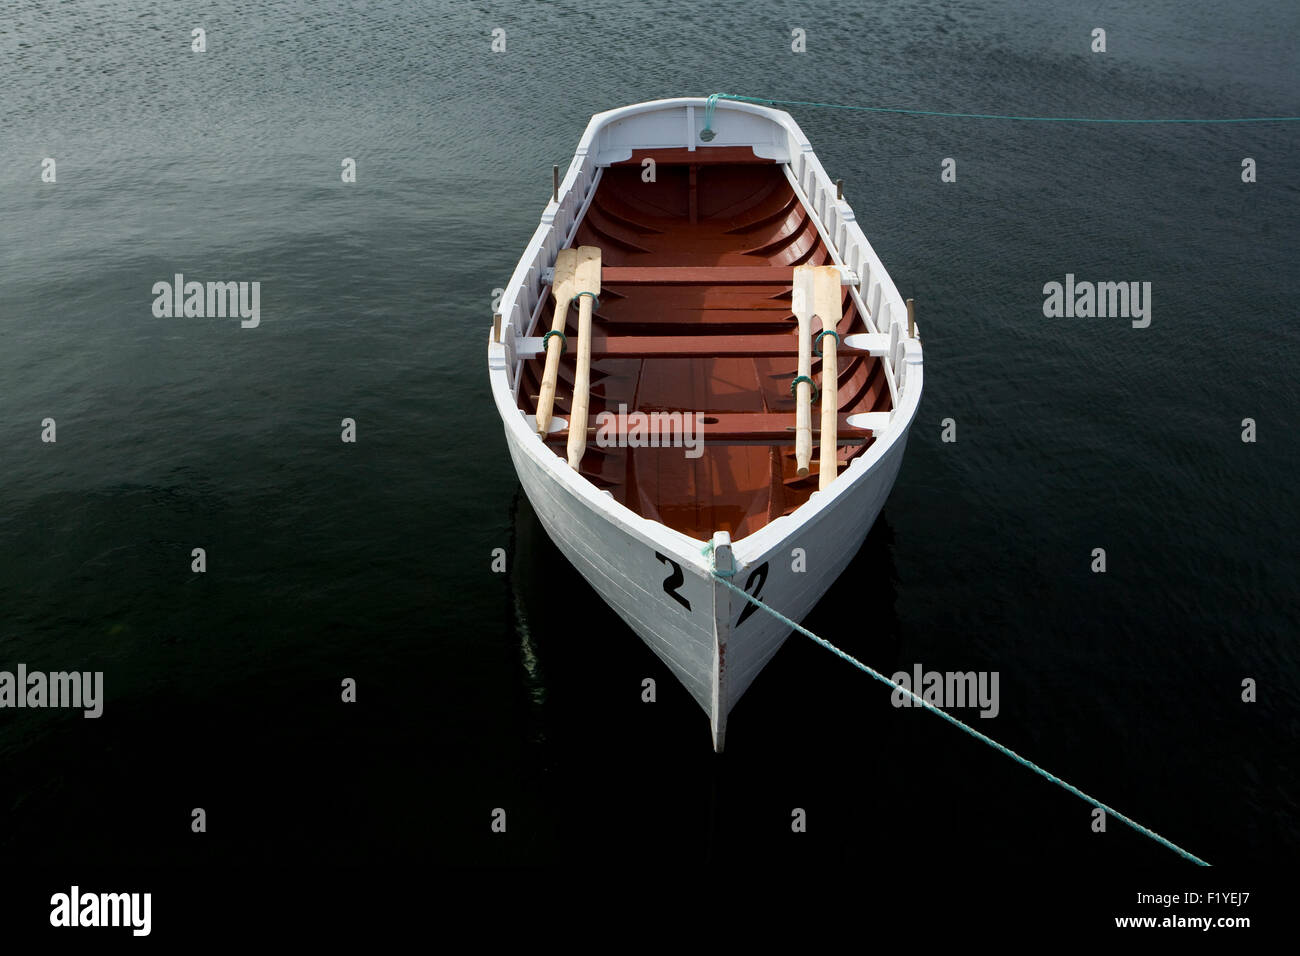 First,Light,1 Object,Atlantic Ocean,Boat,Boats - Stock Image